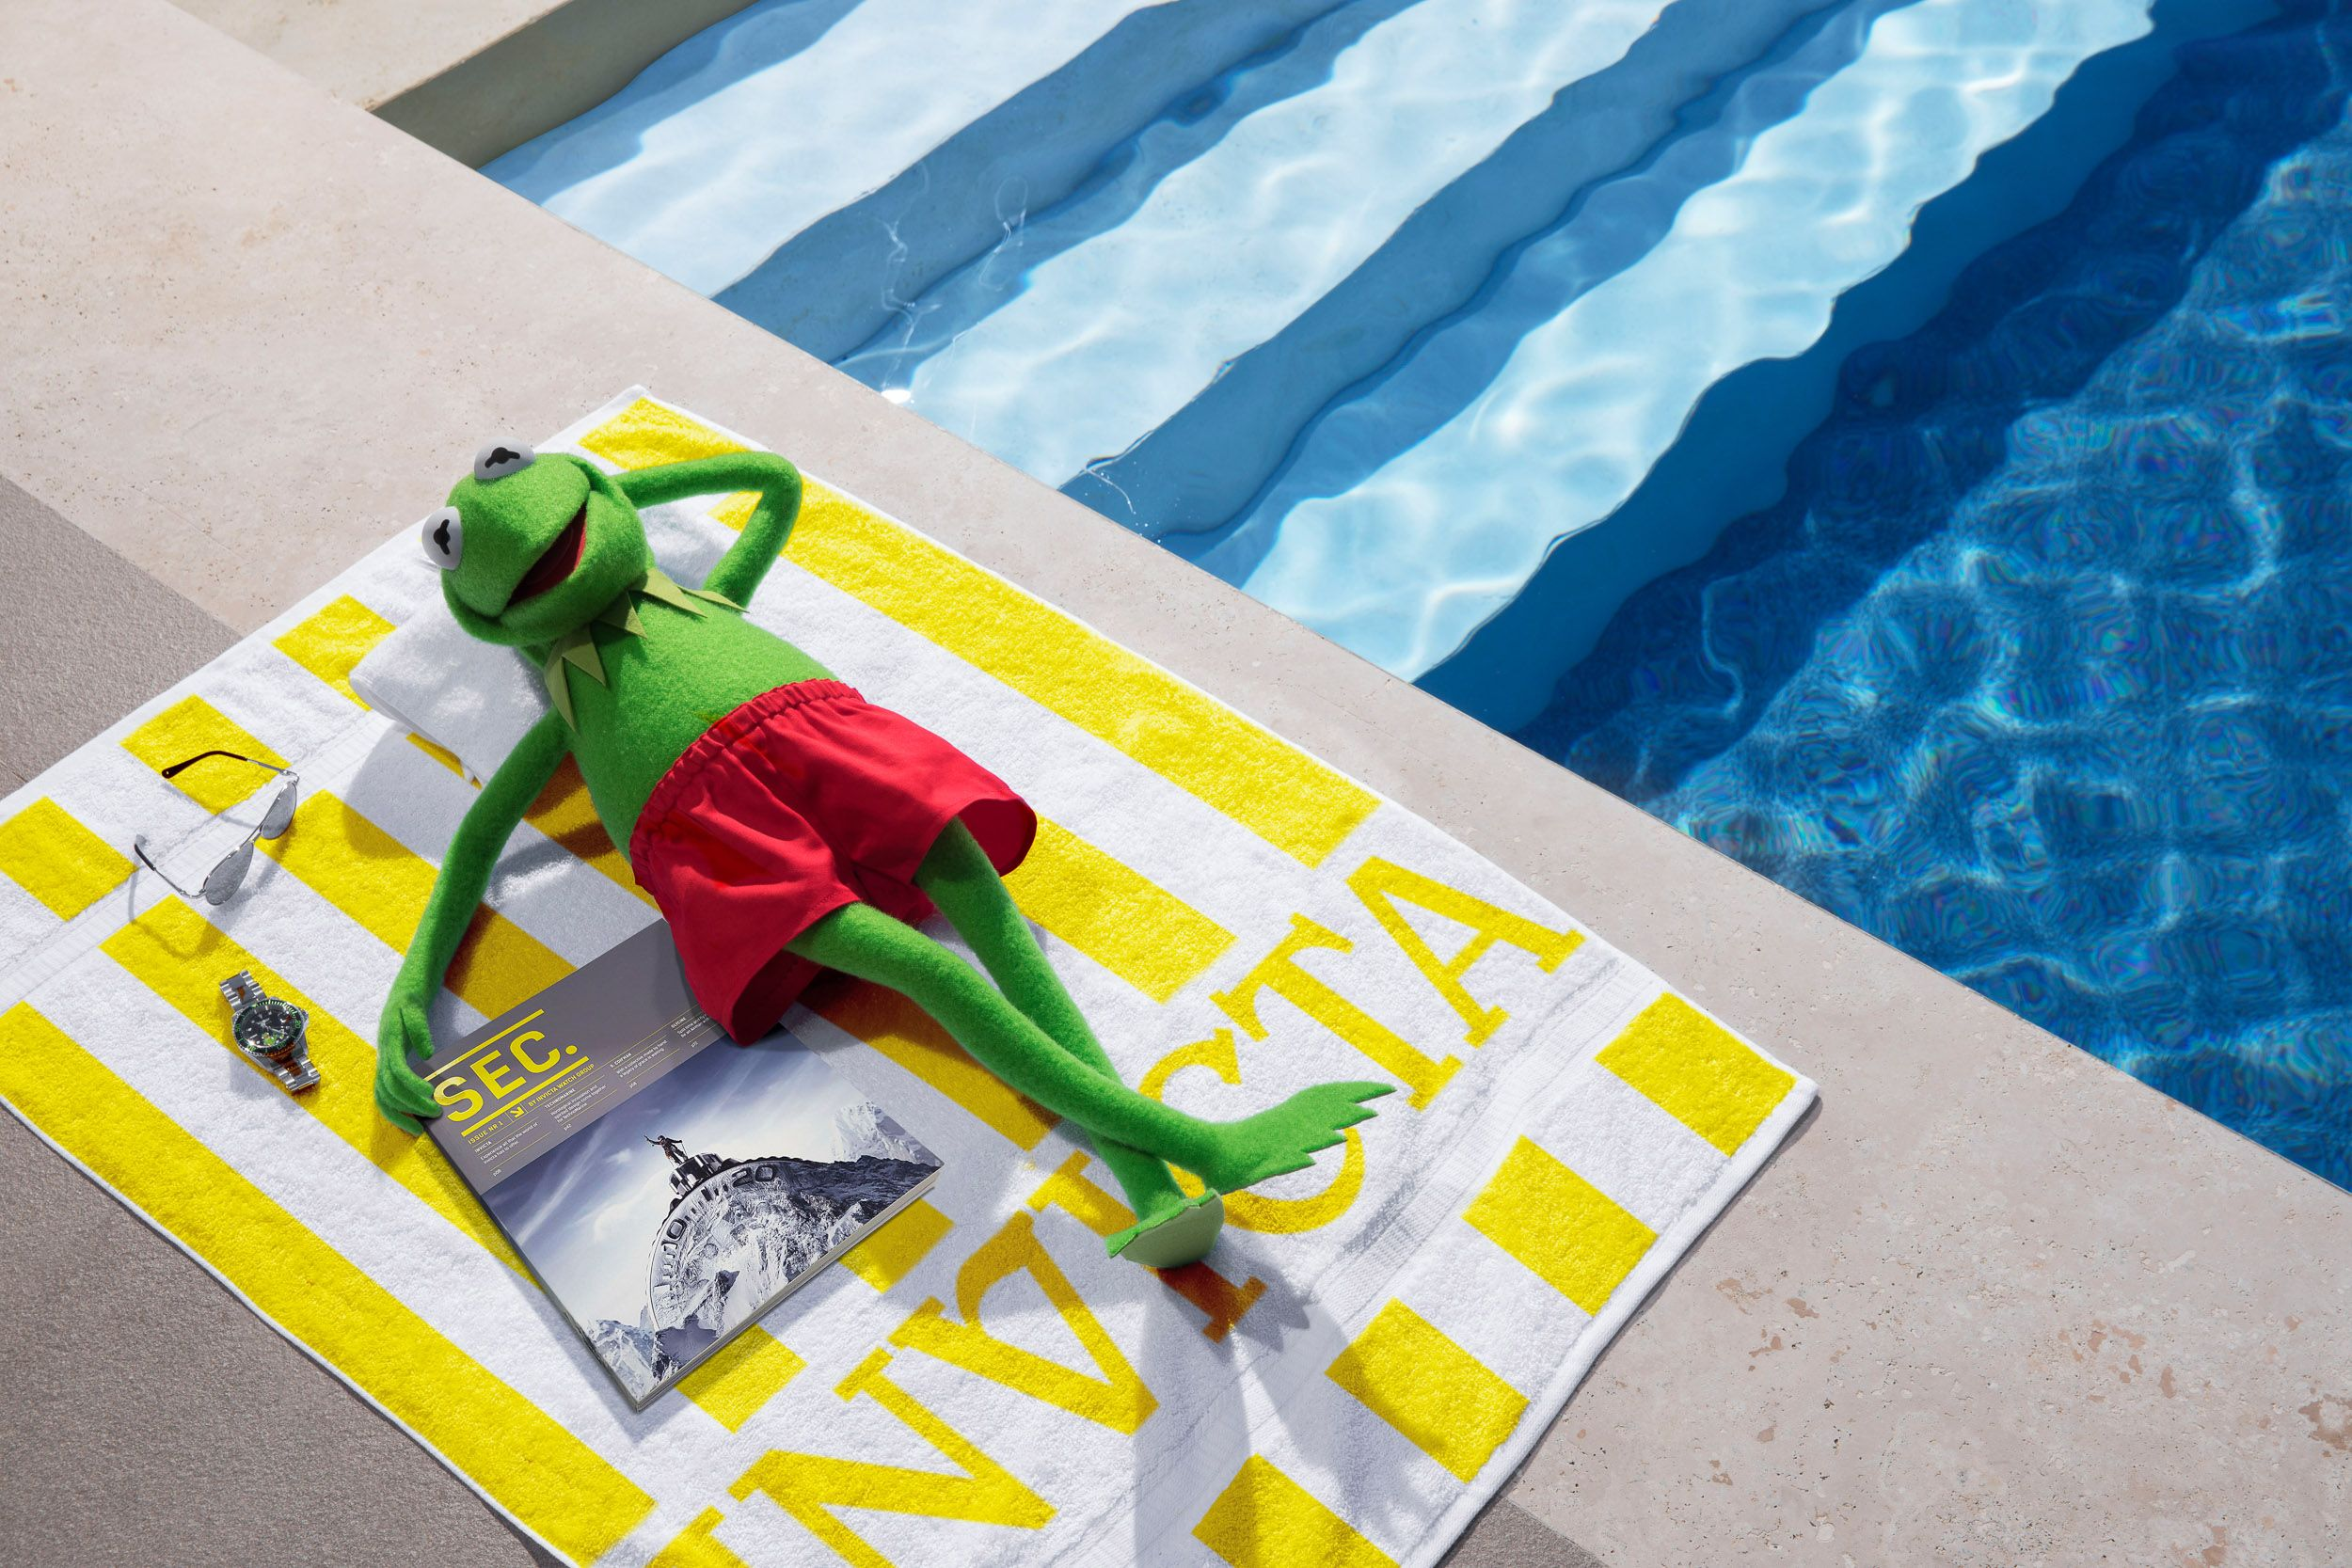 Kermit Handdoek Final.JPG